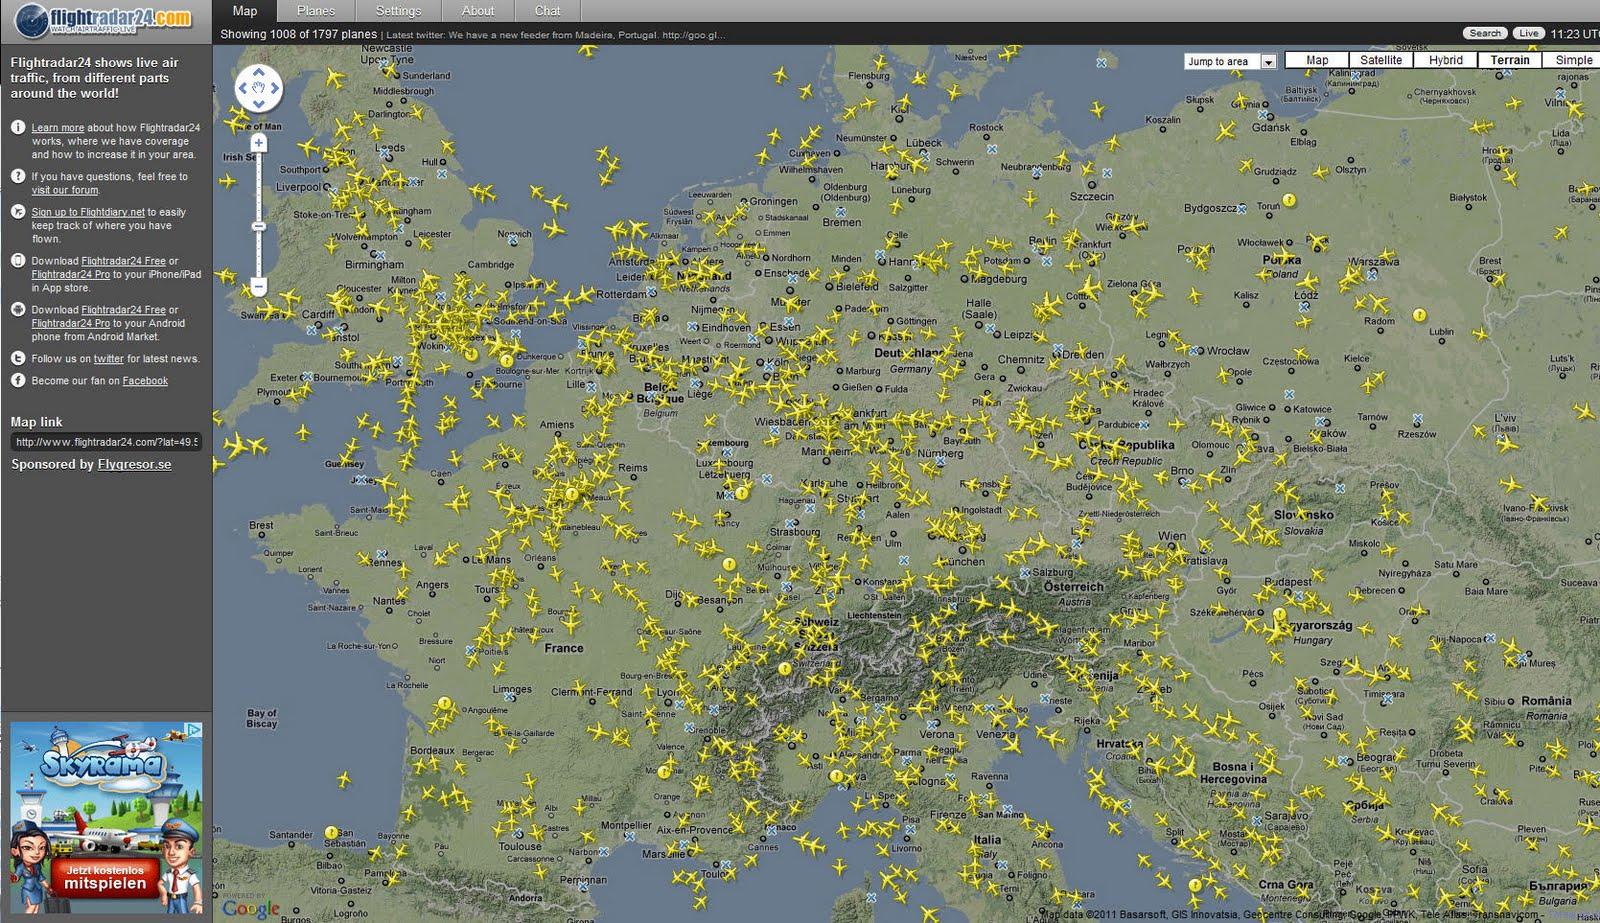 Flightradar24 Live Den Flugverkehr Fast Weltweit Beobachten